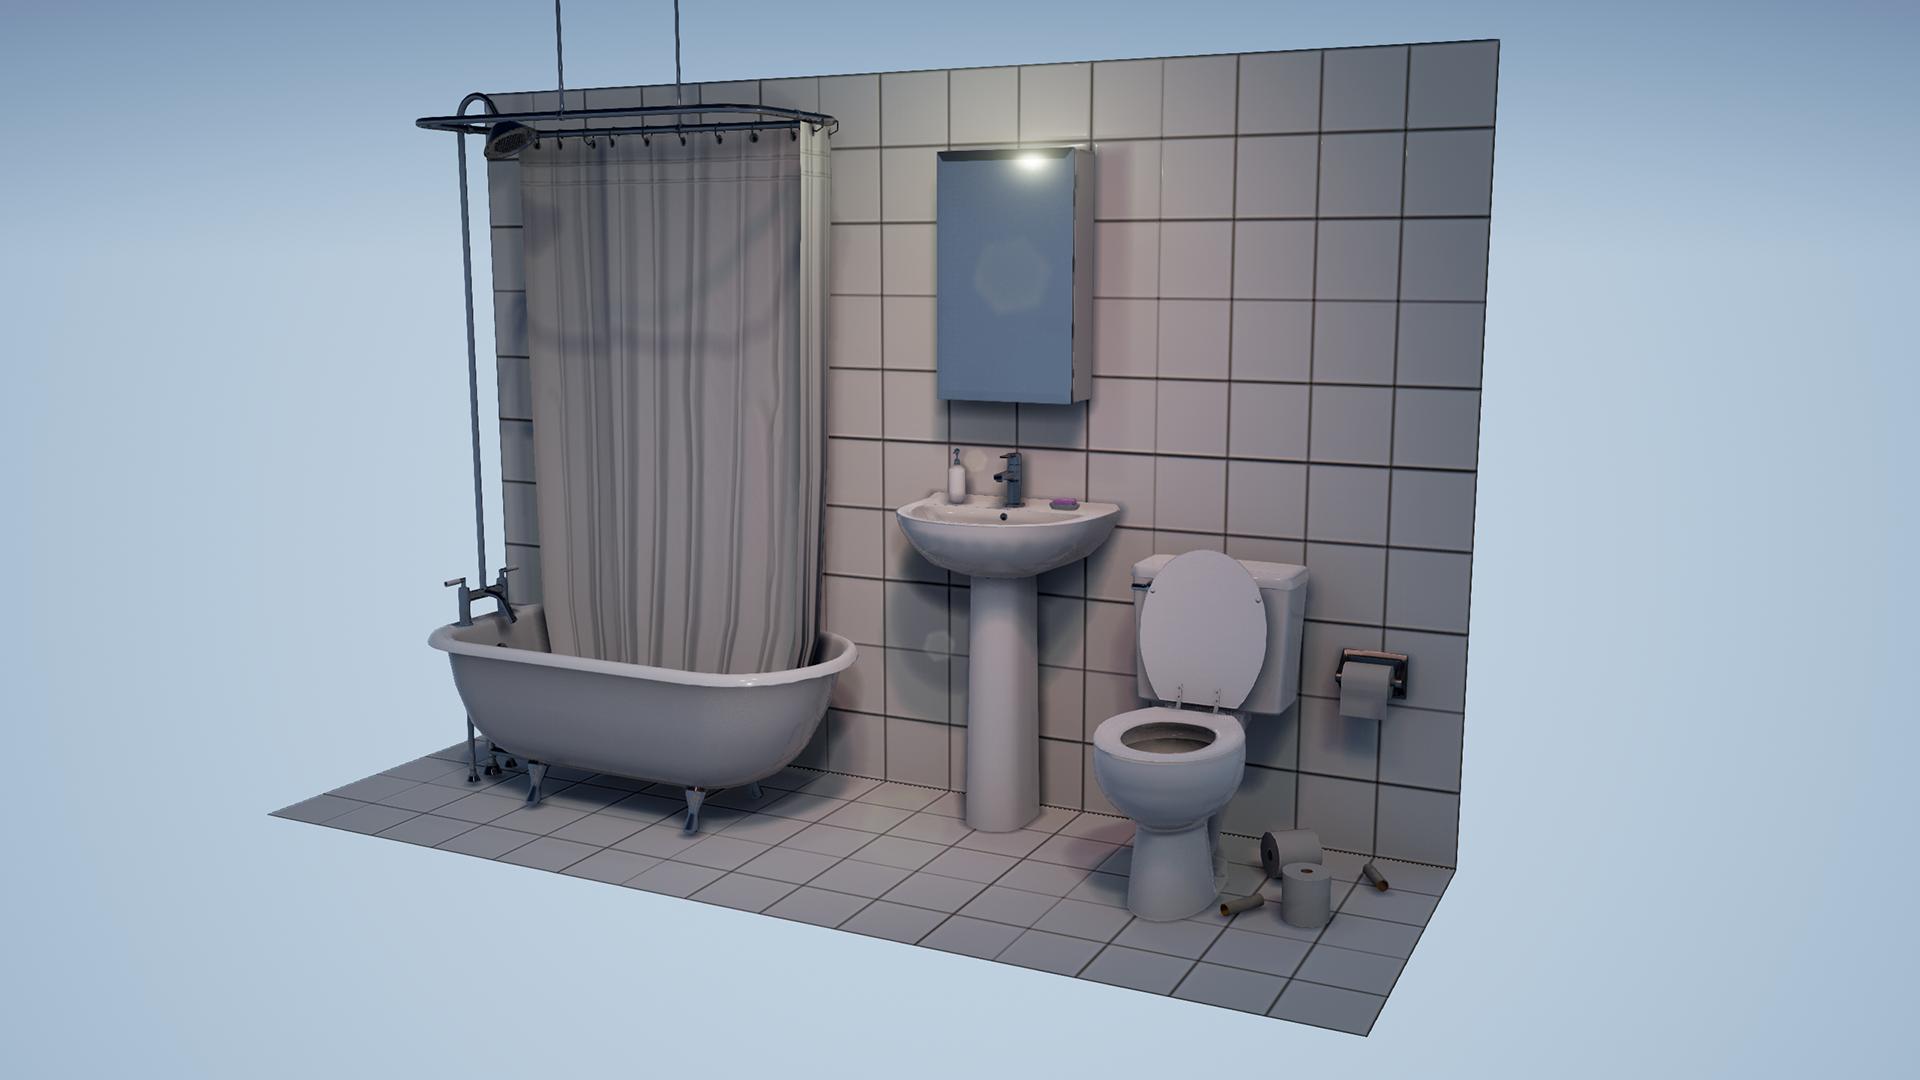 share store bathroompackseries screenshot  x adaceaeebacfaafe: architecture bathroom toilet